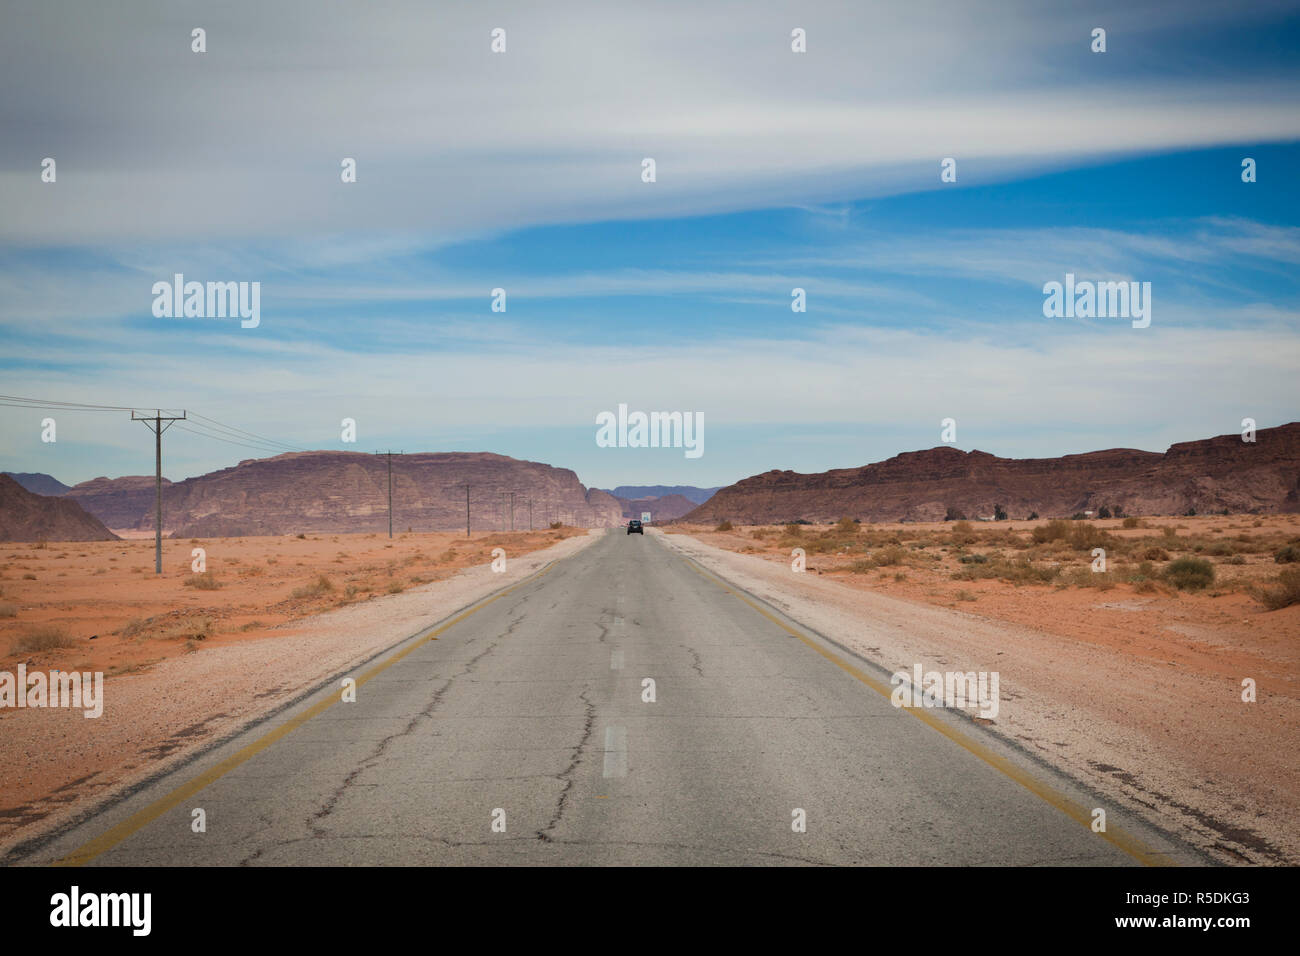 Jordan, Wadi Rum, desert road to Rum village - Stock Image